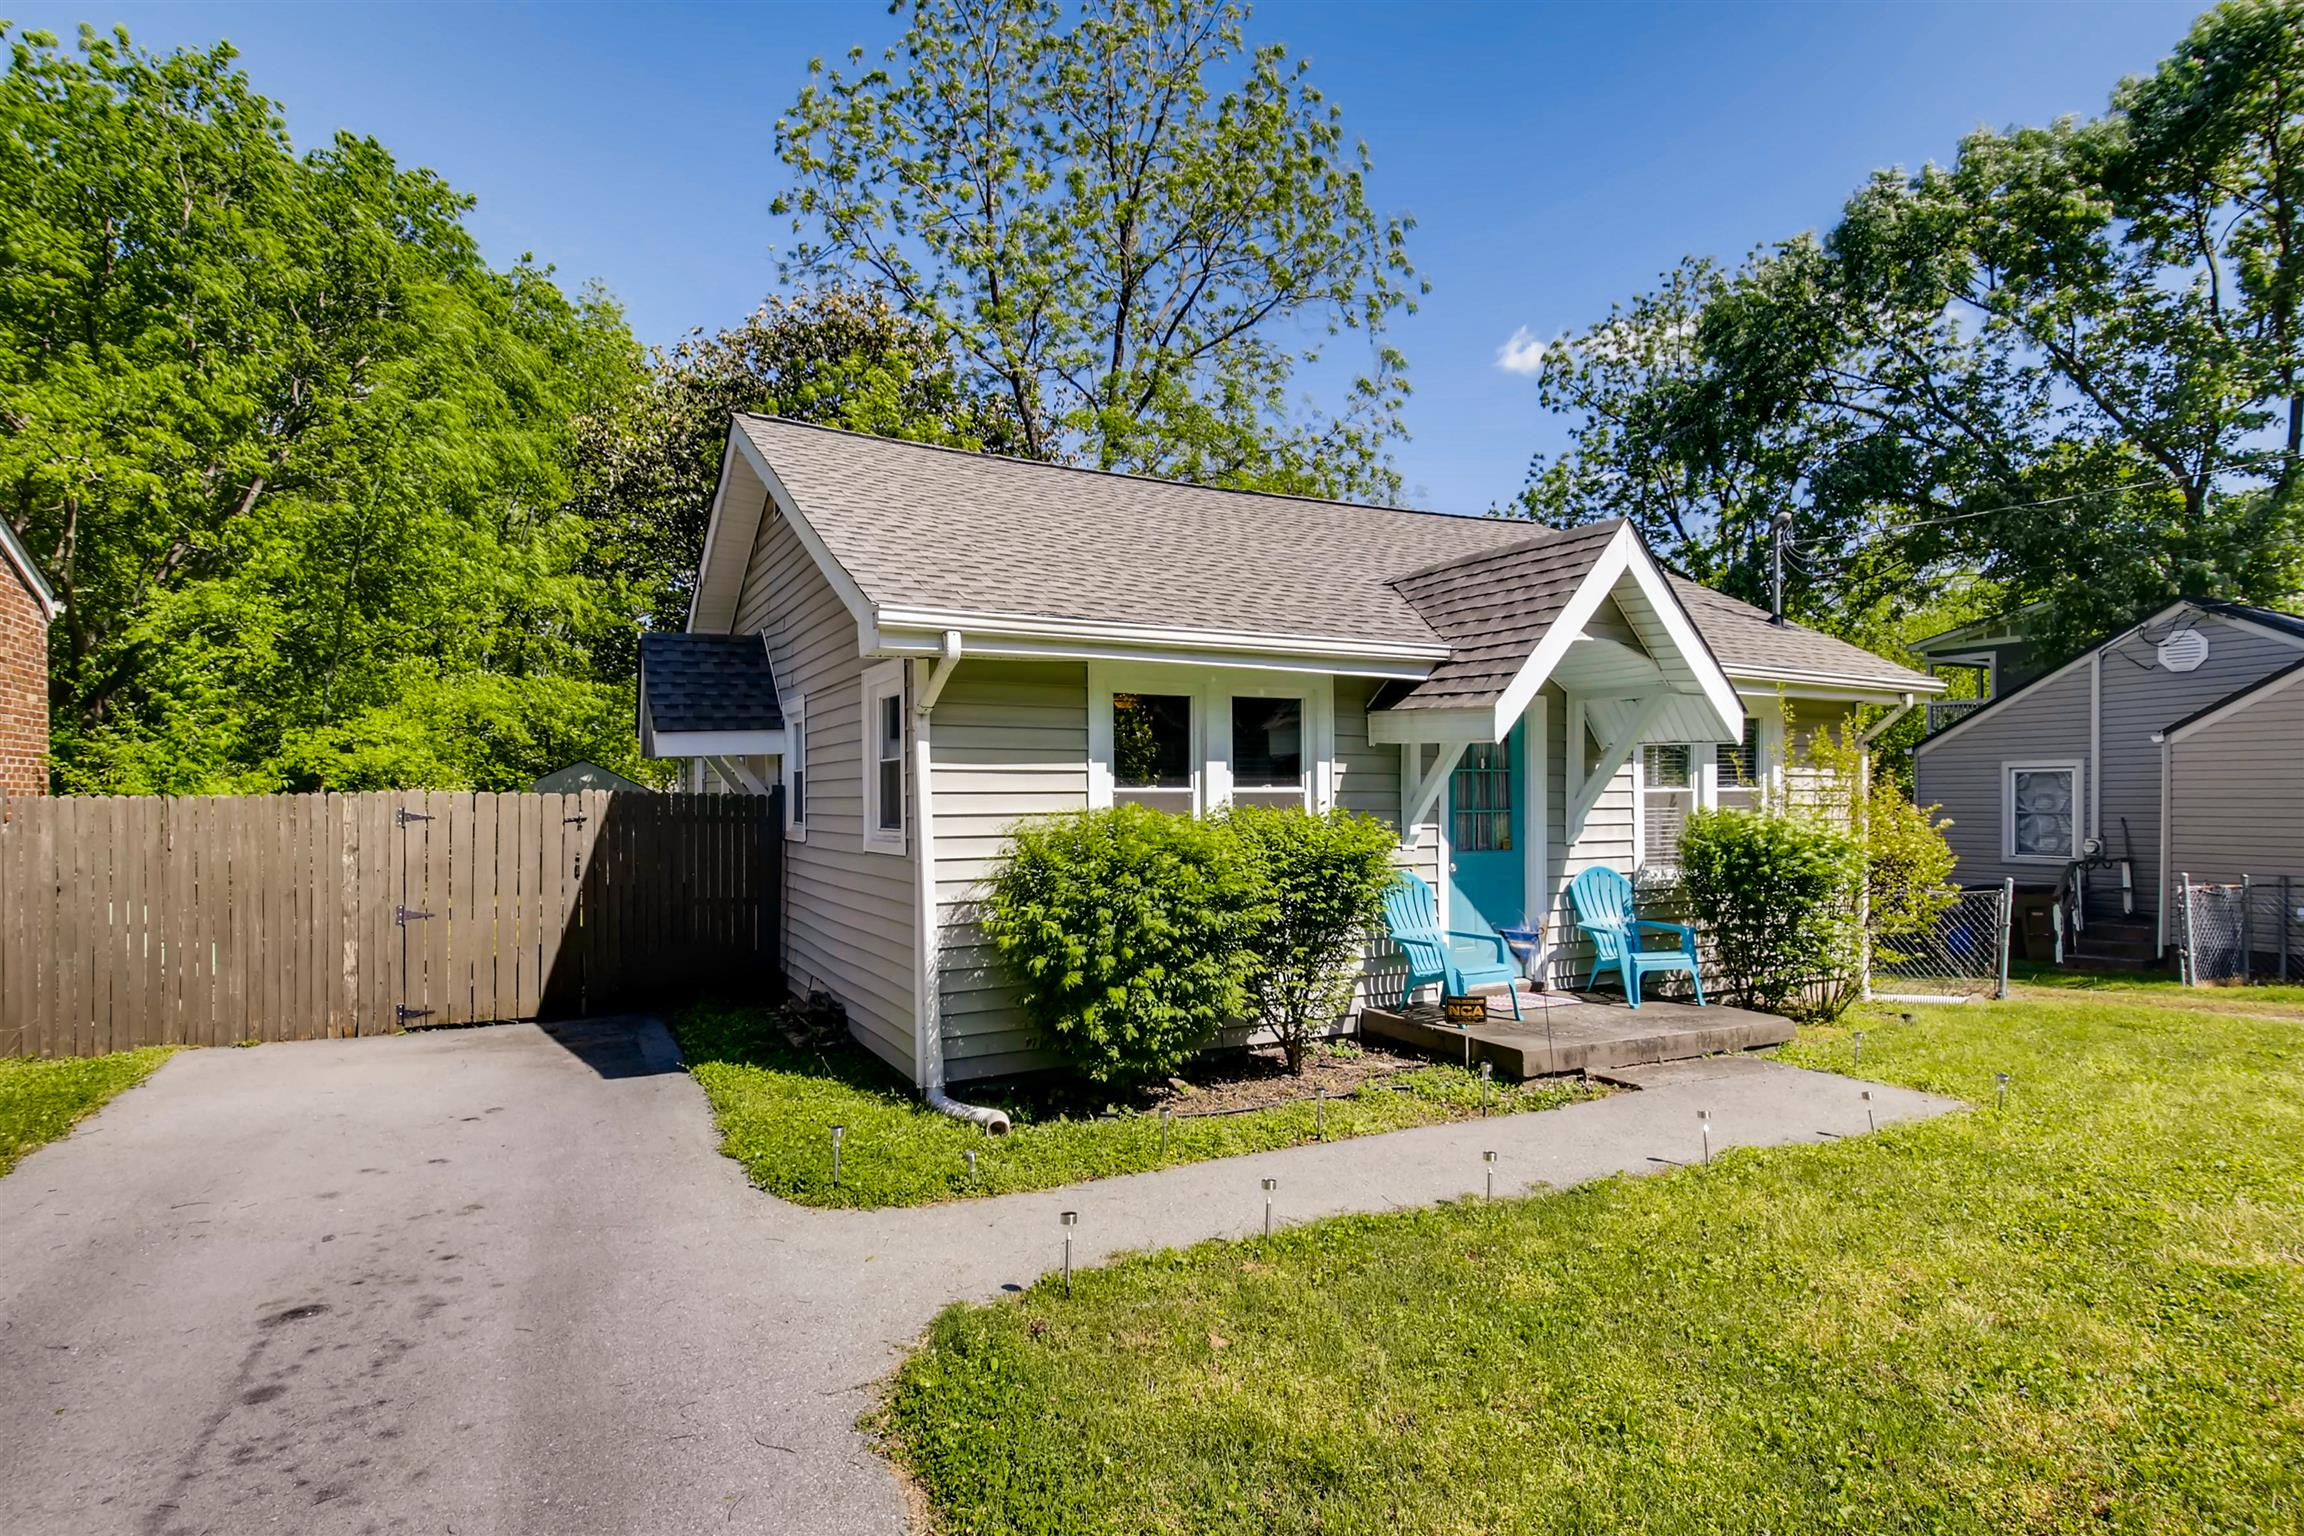 1411 Stainback Ave, Nashville, TN 37207 - Nashville, TN real estate listing